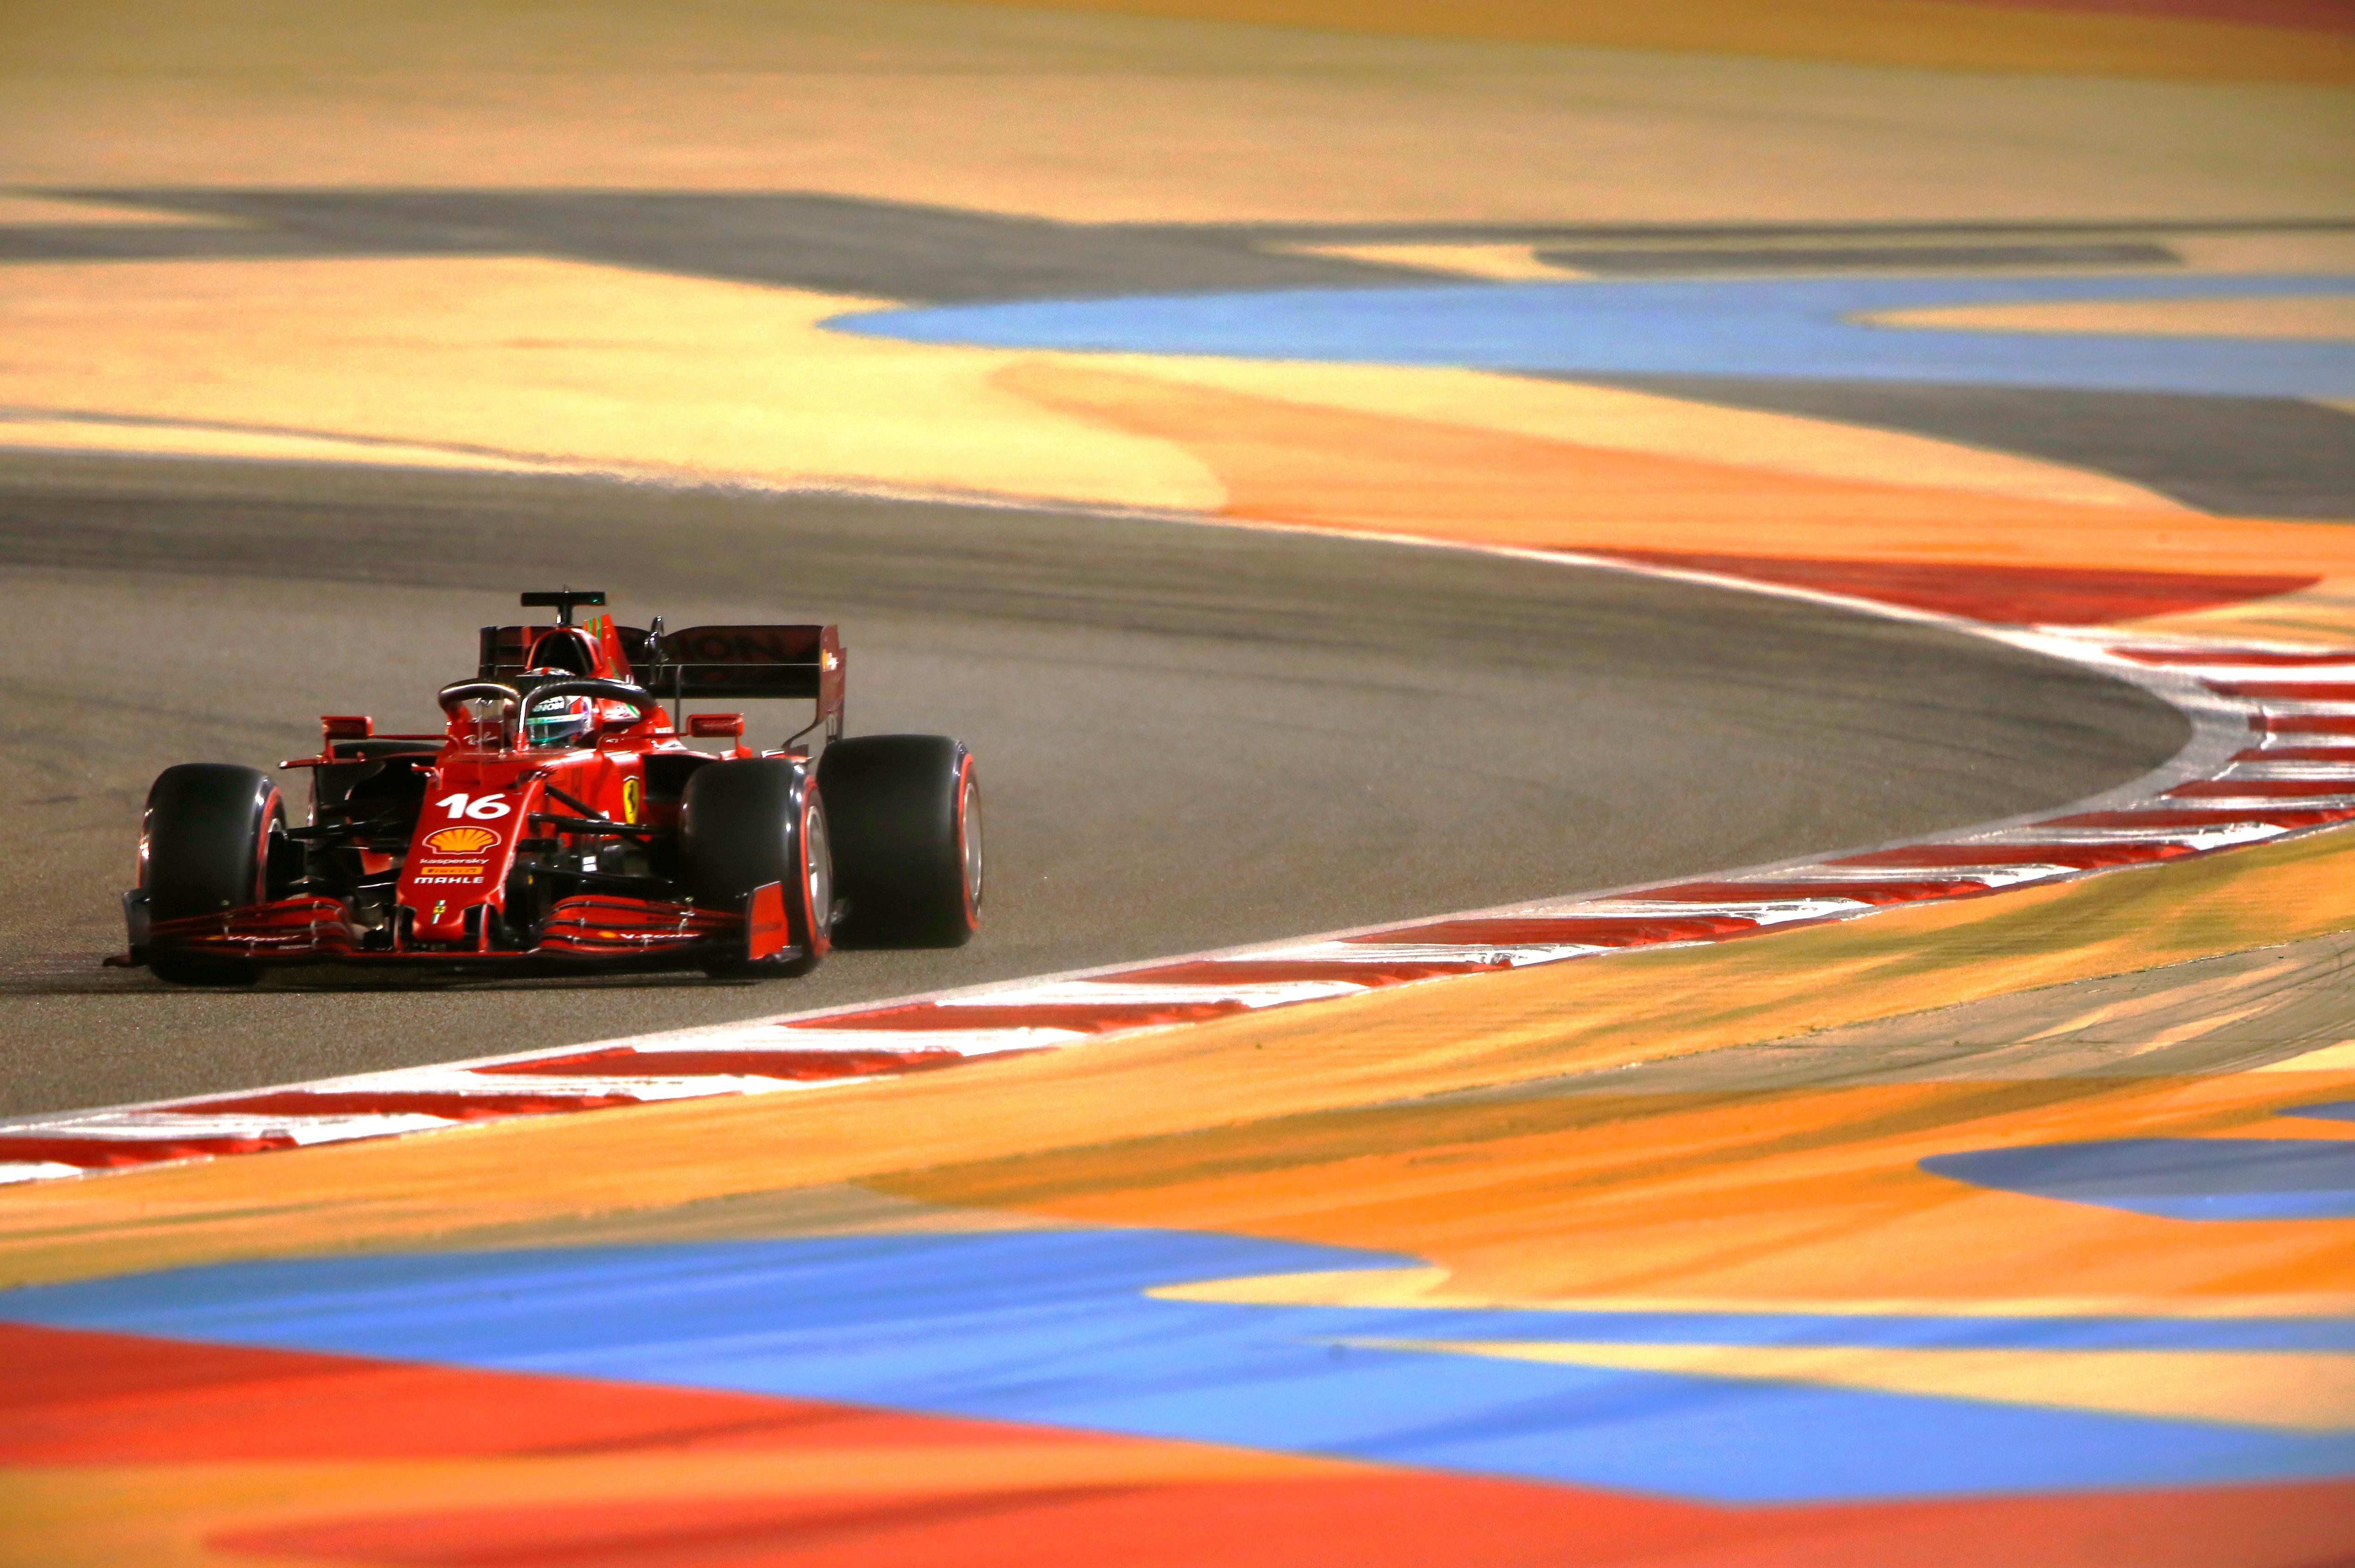 Charles Leclerc, Ferrari, Bahrain Grand Prix